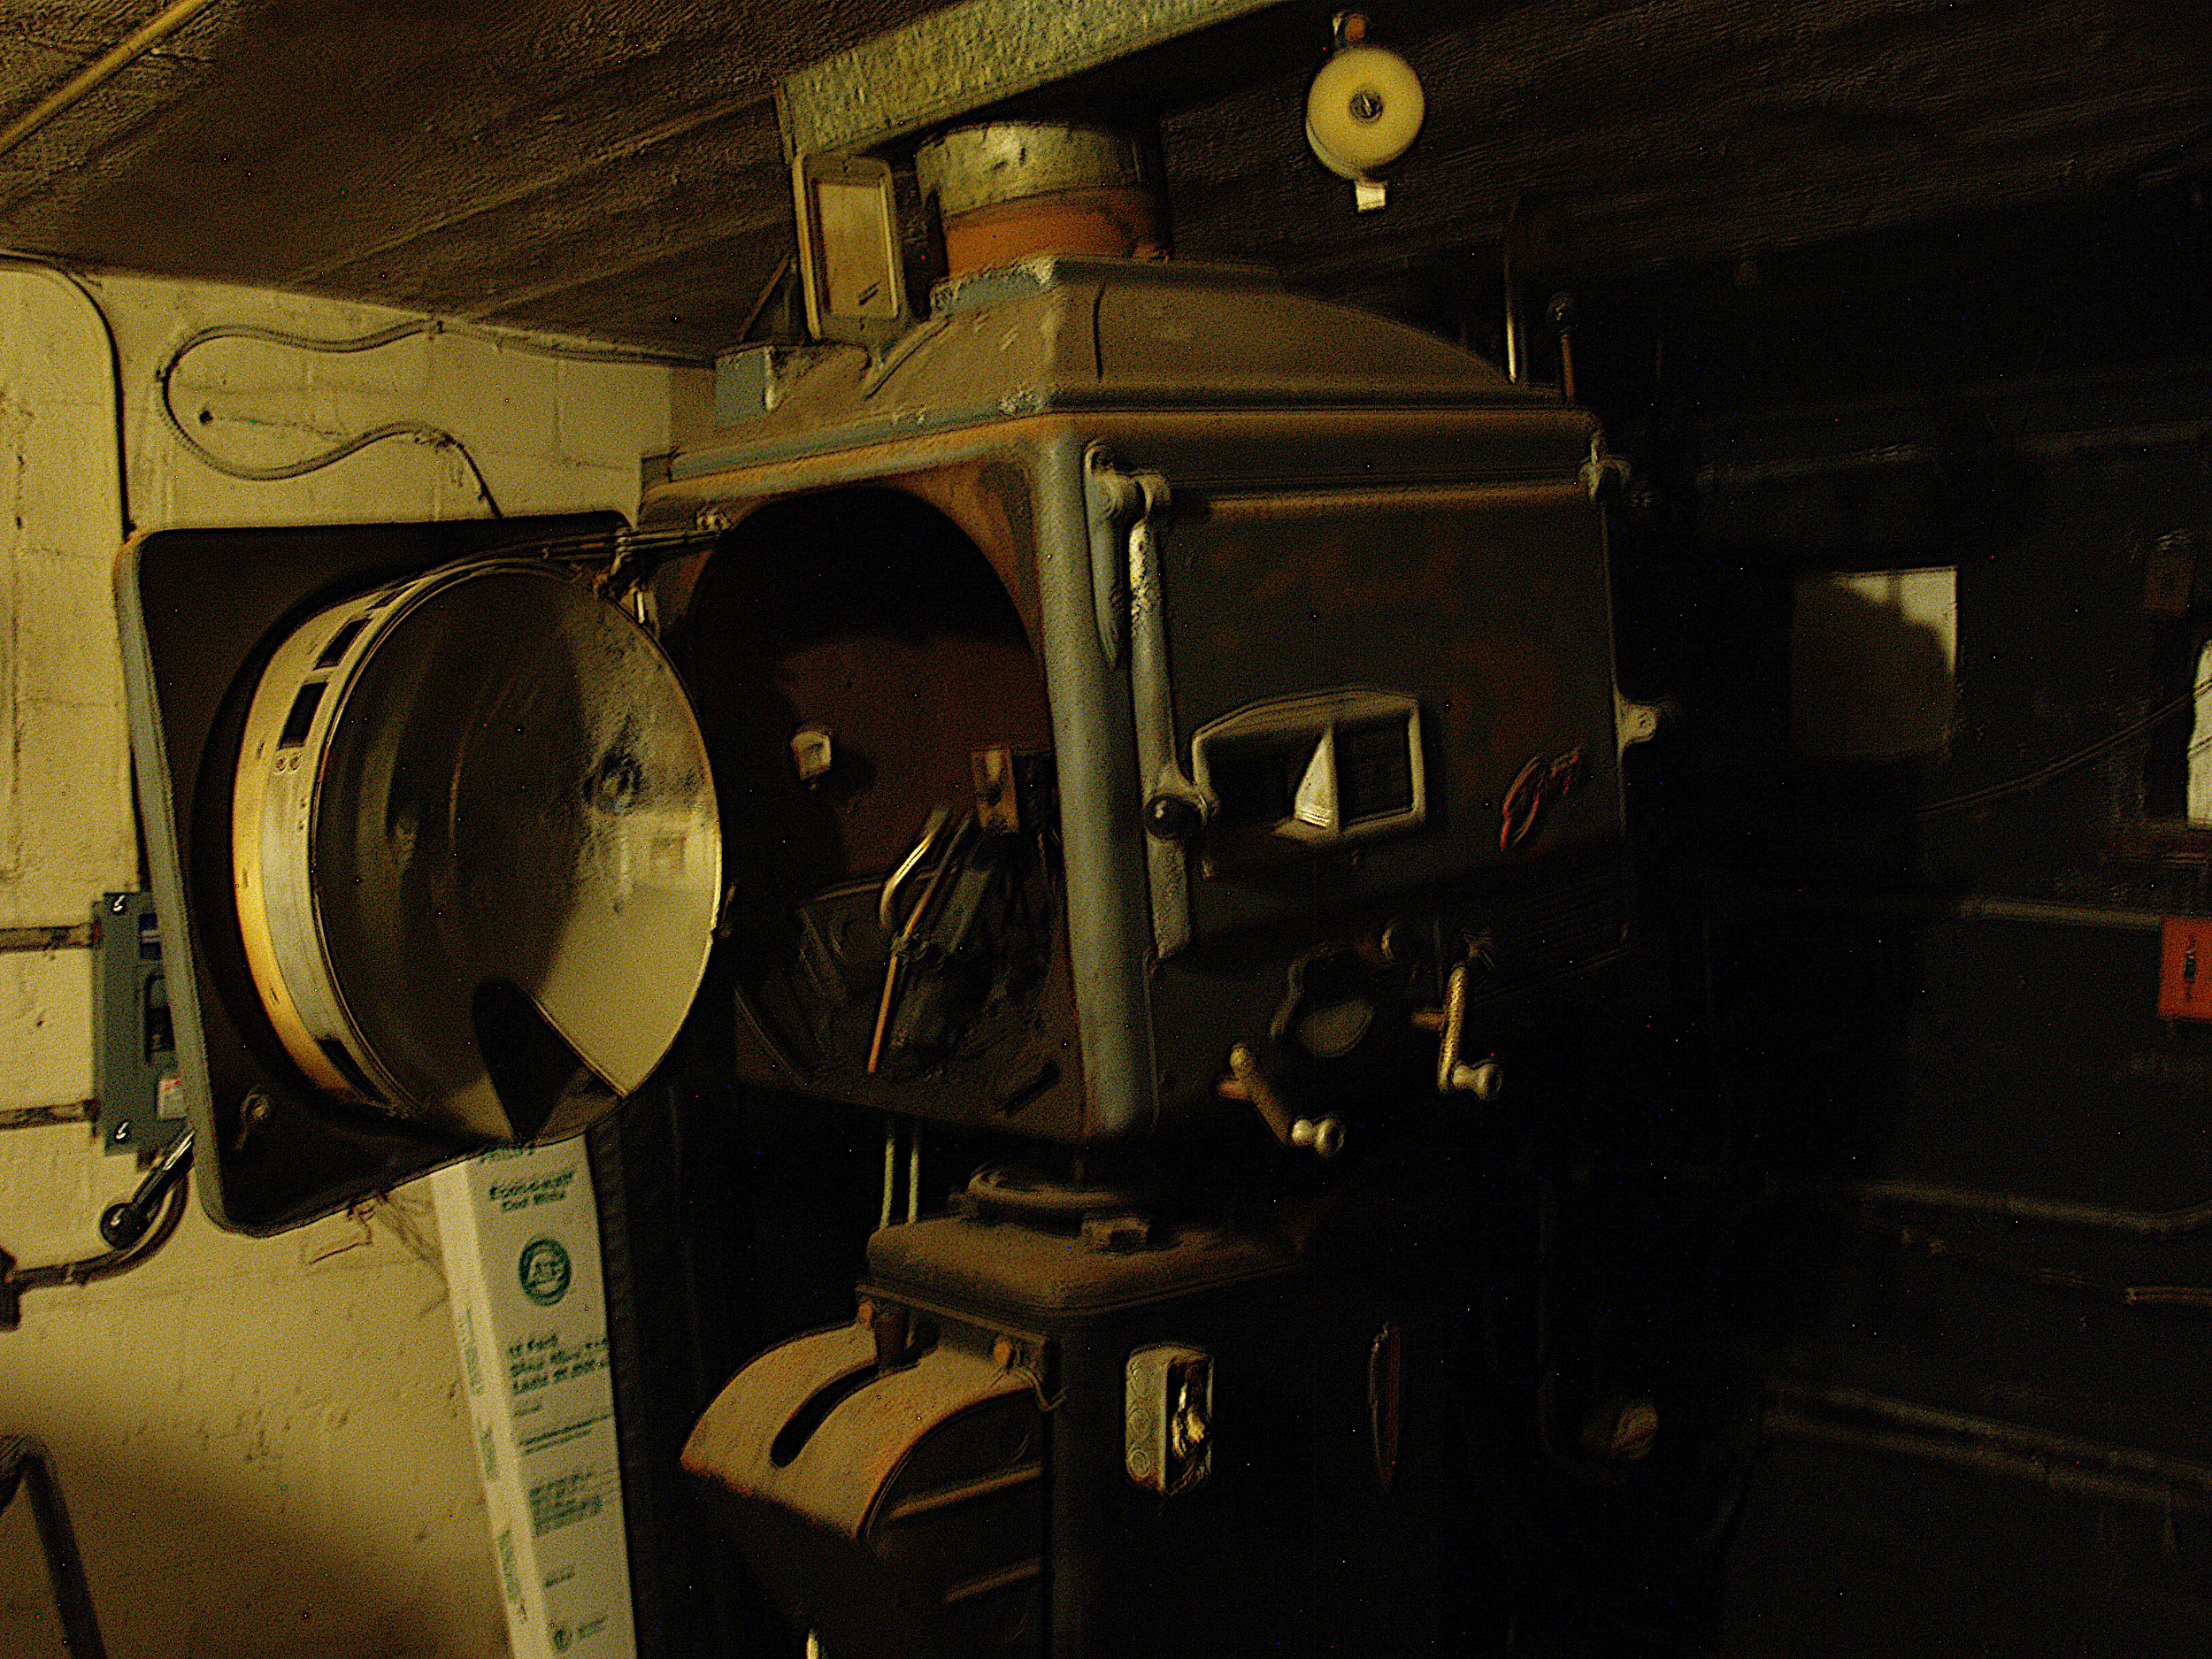 The projector hidden underground.